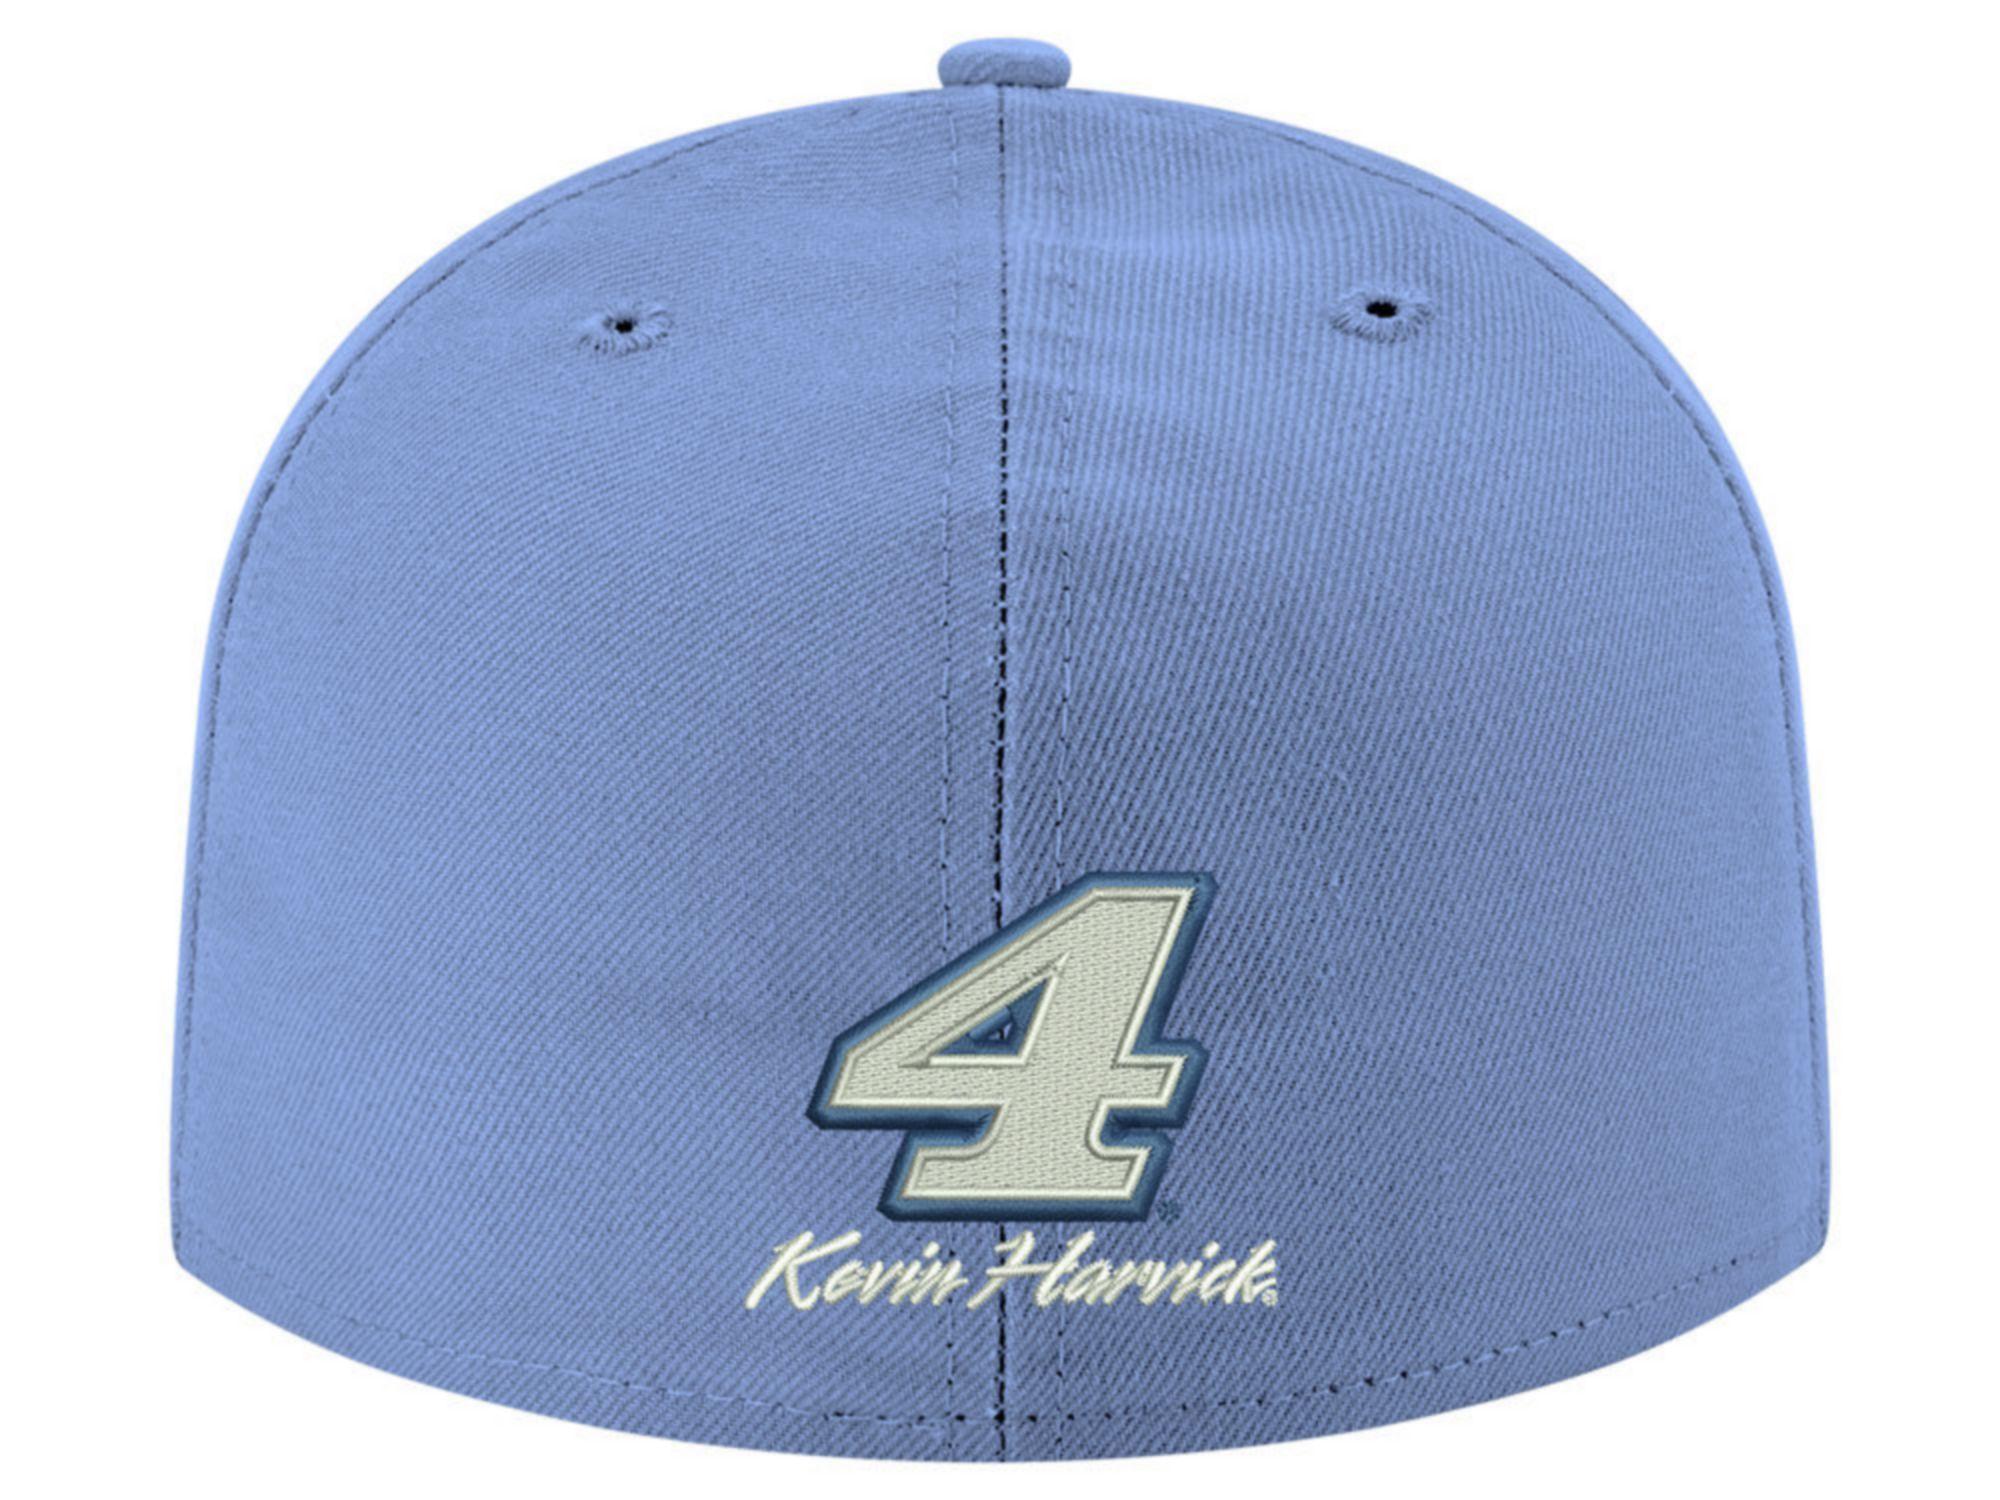 New Era Kevin Harvick Custom MotorSport 59FIFTY Cap & Reviews - Nascar - Sports Fan Shop - Macy's